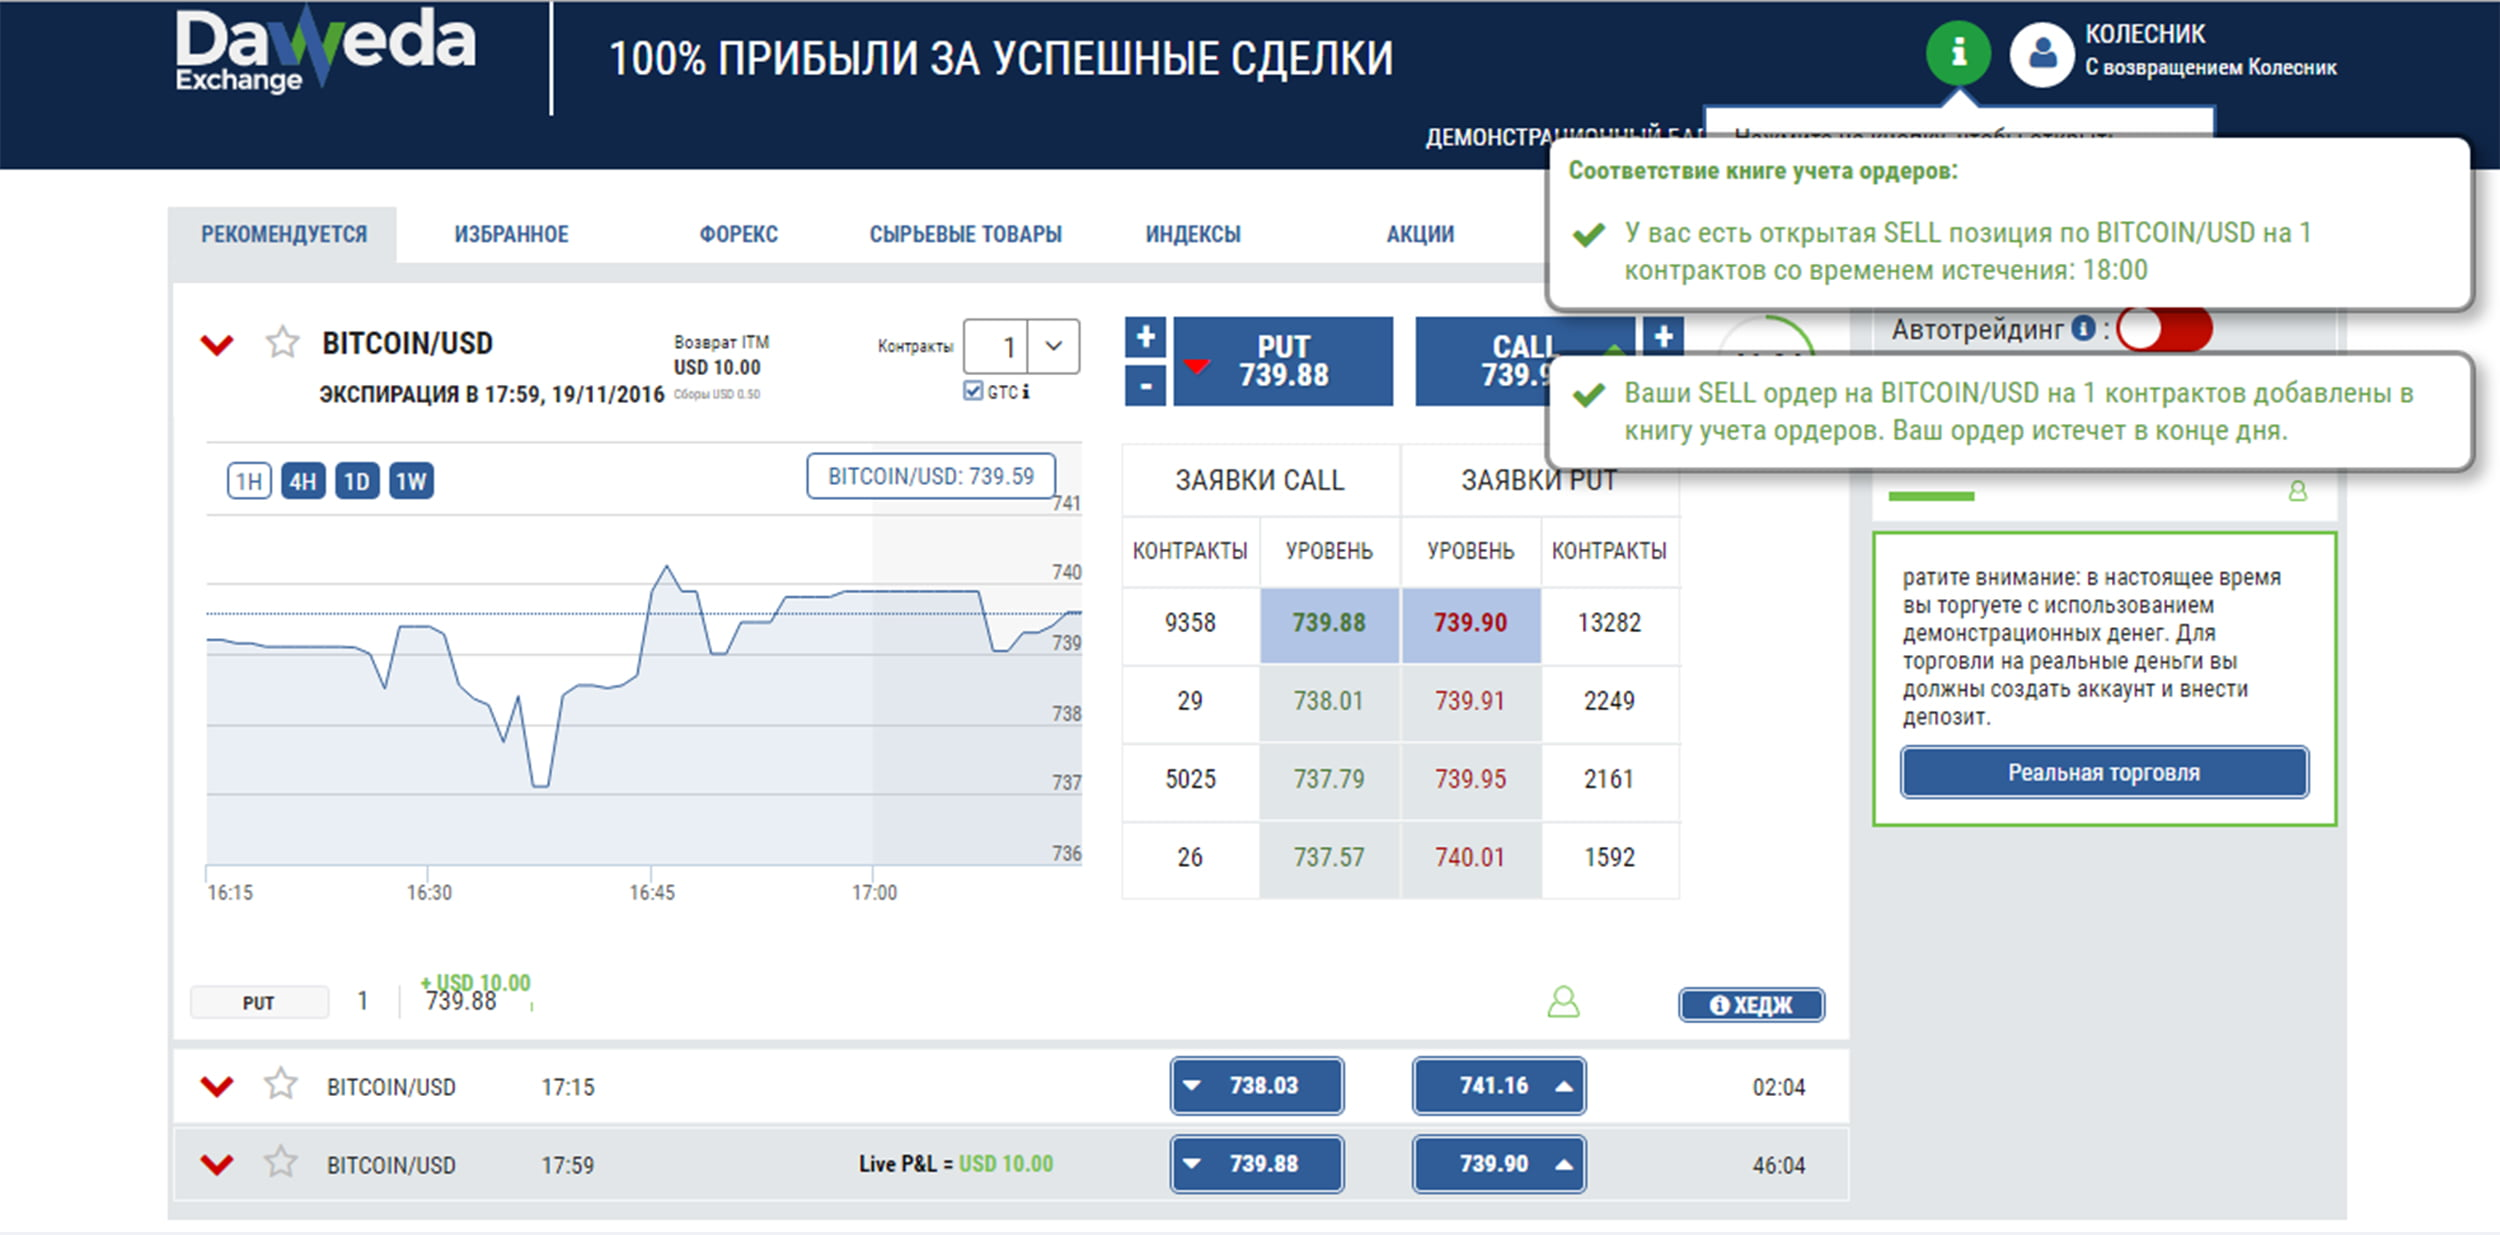 Торговля опционами на Daweda Exchange